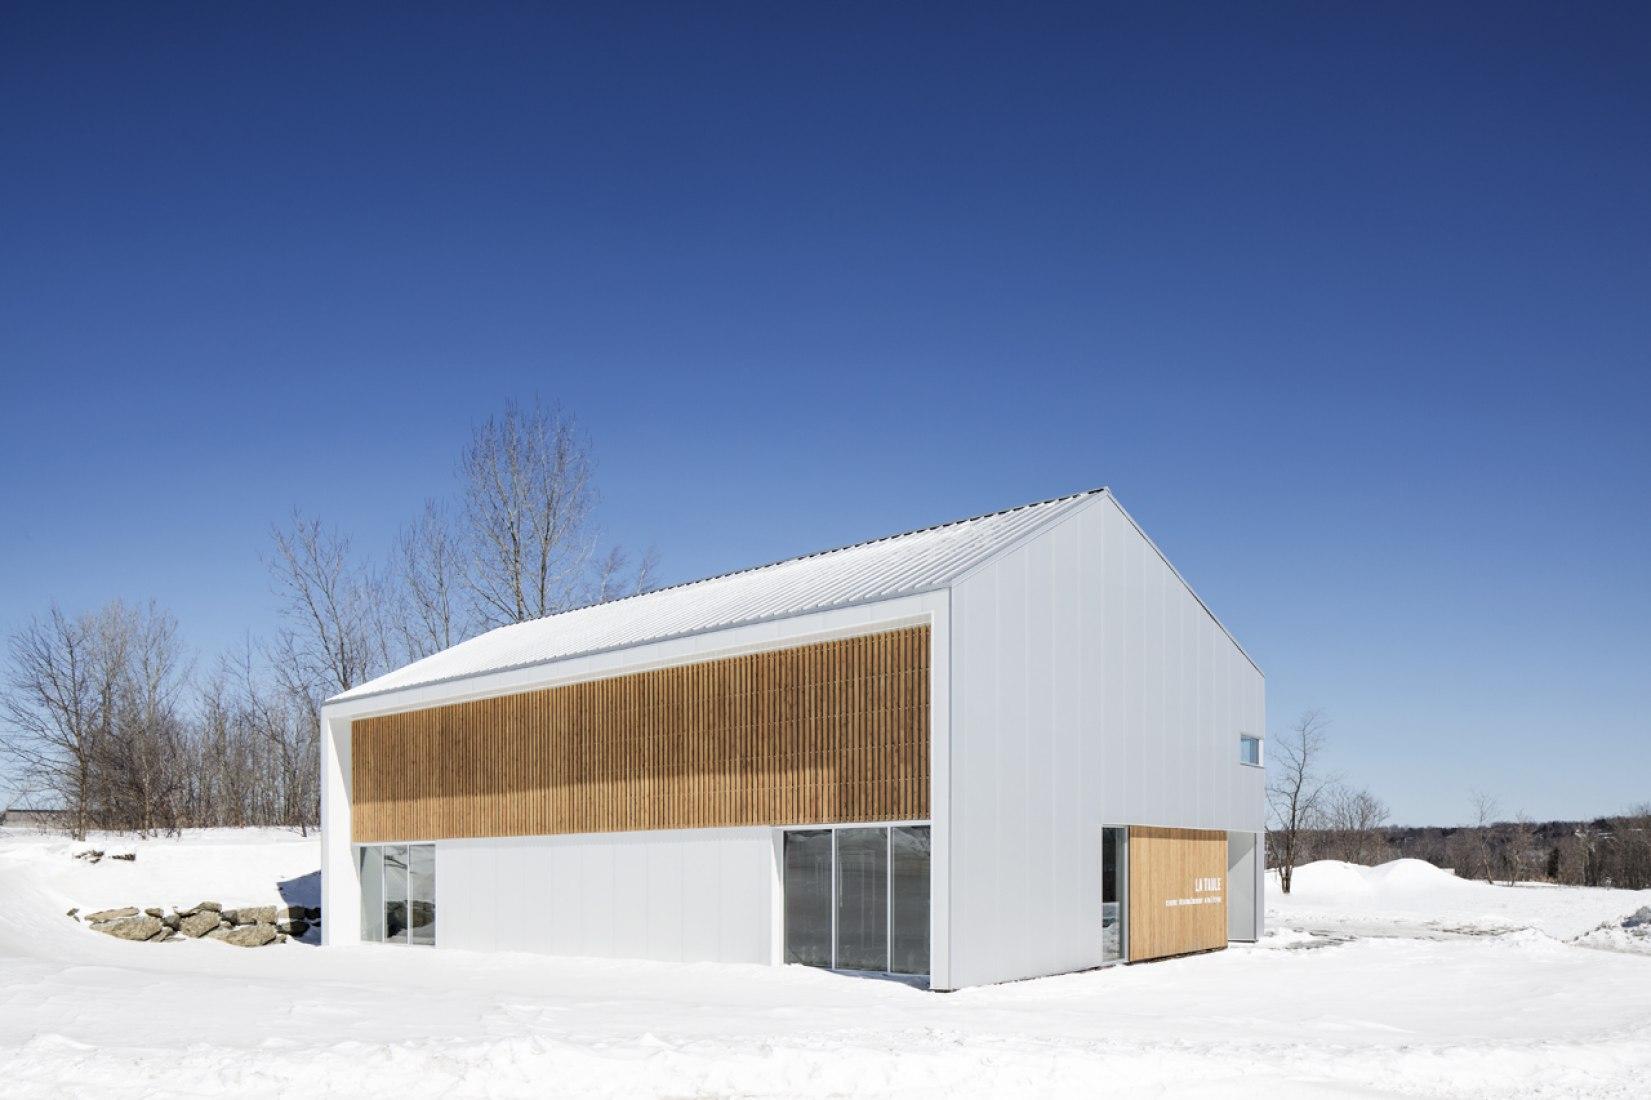 Exterior view. Sport Centre La Taule by microclimat. Photography © Adrien Williams.